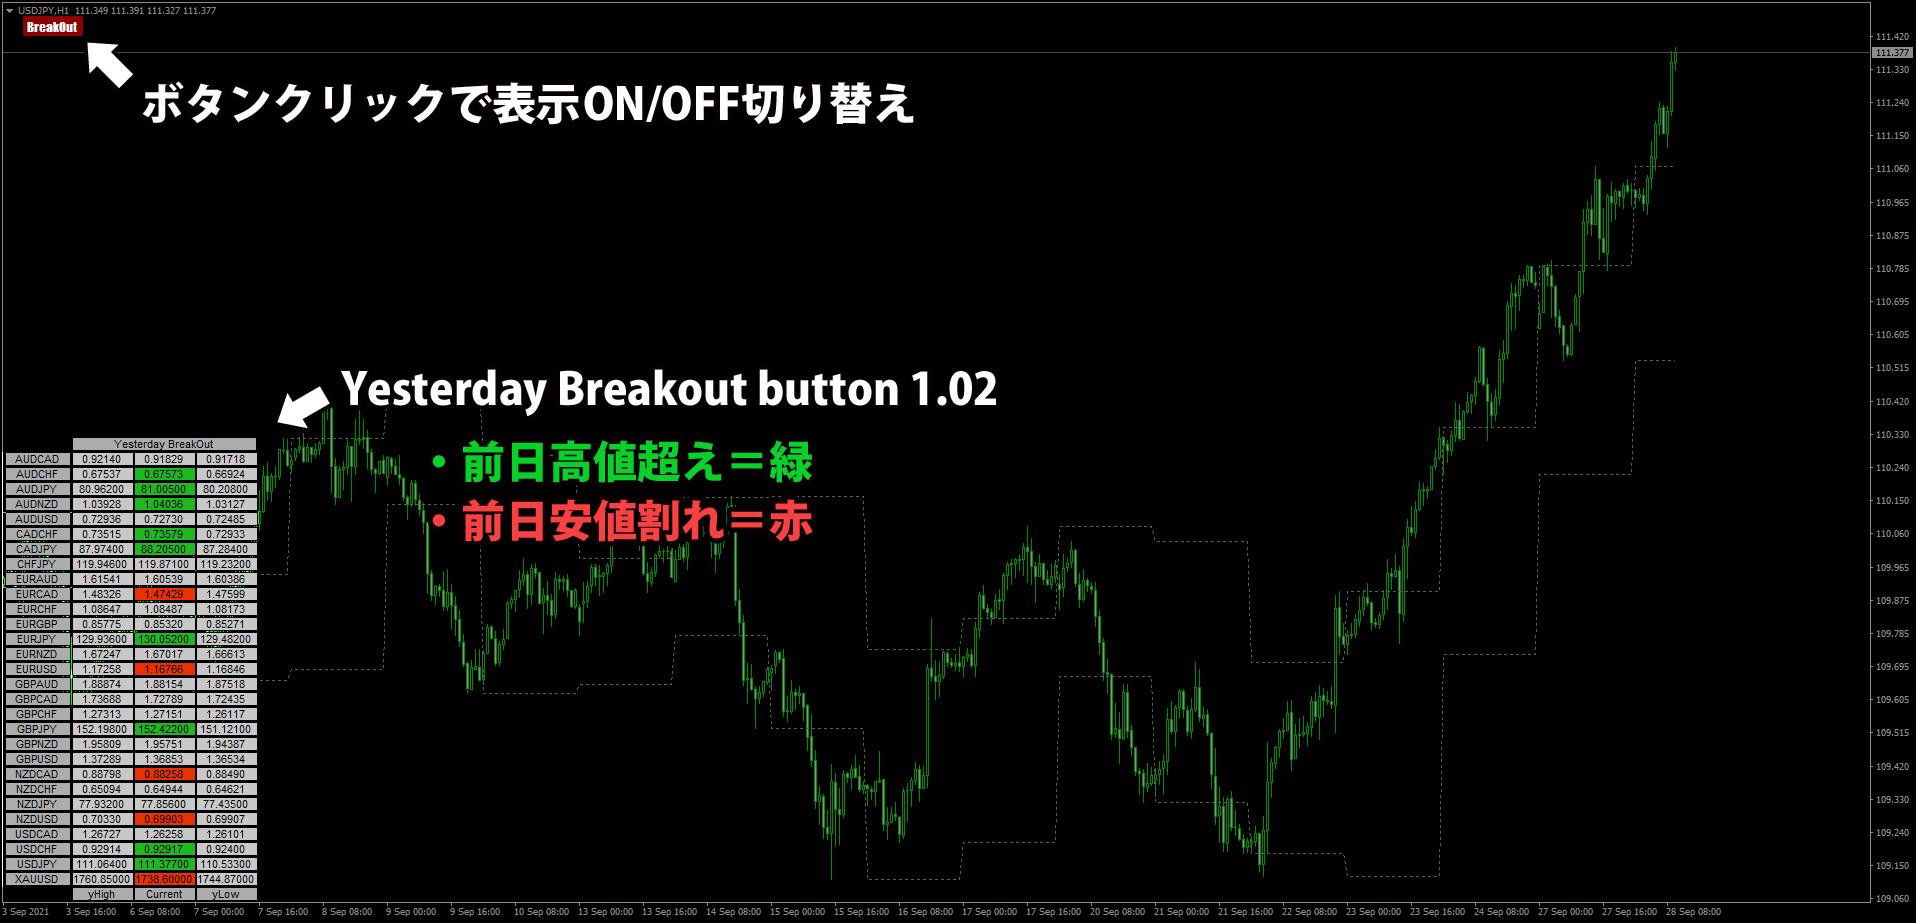 Yesterday Breakout button 1.02を表示したチャート